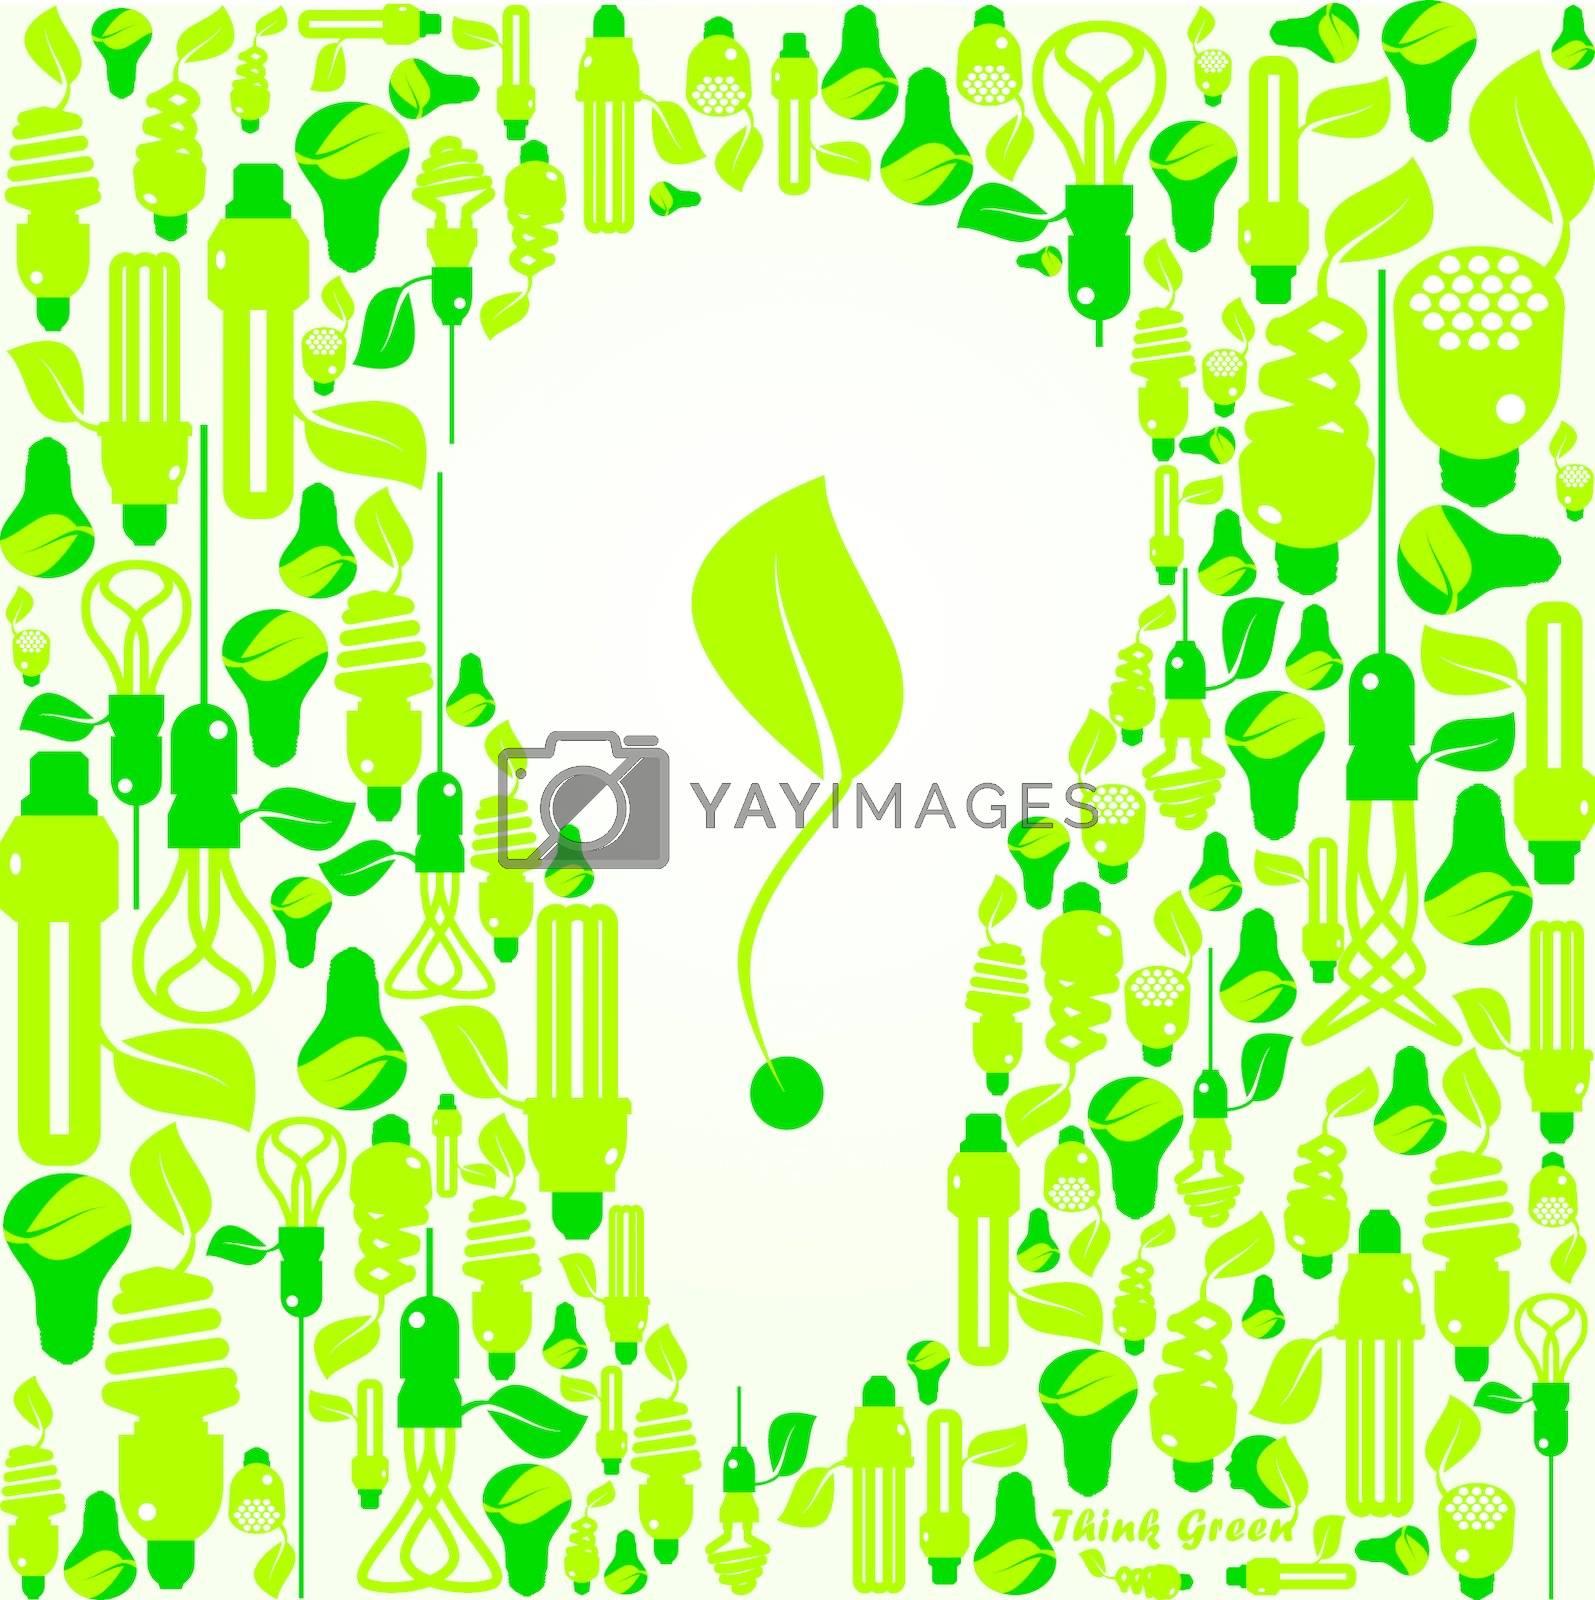 Variety of energy efficient lightbulbs